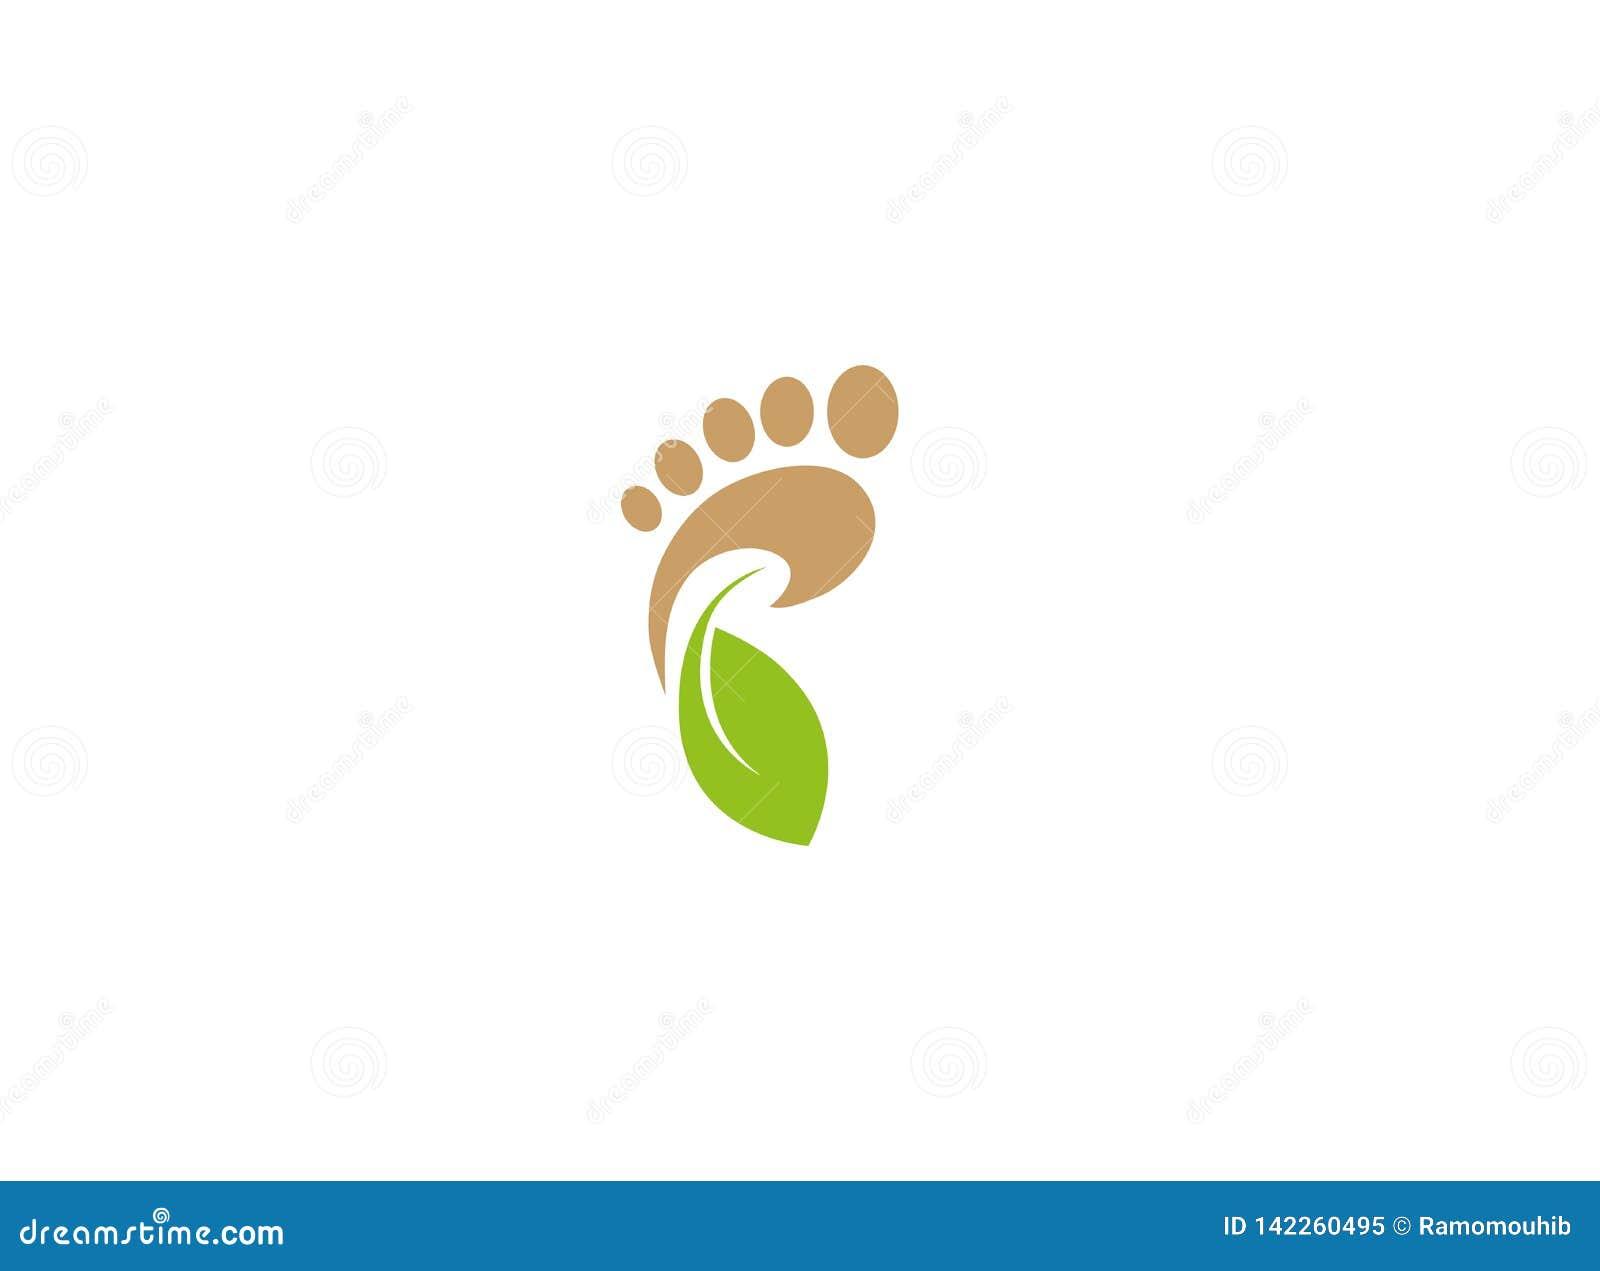 Footprint and health nature, bio care Logo design